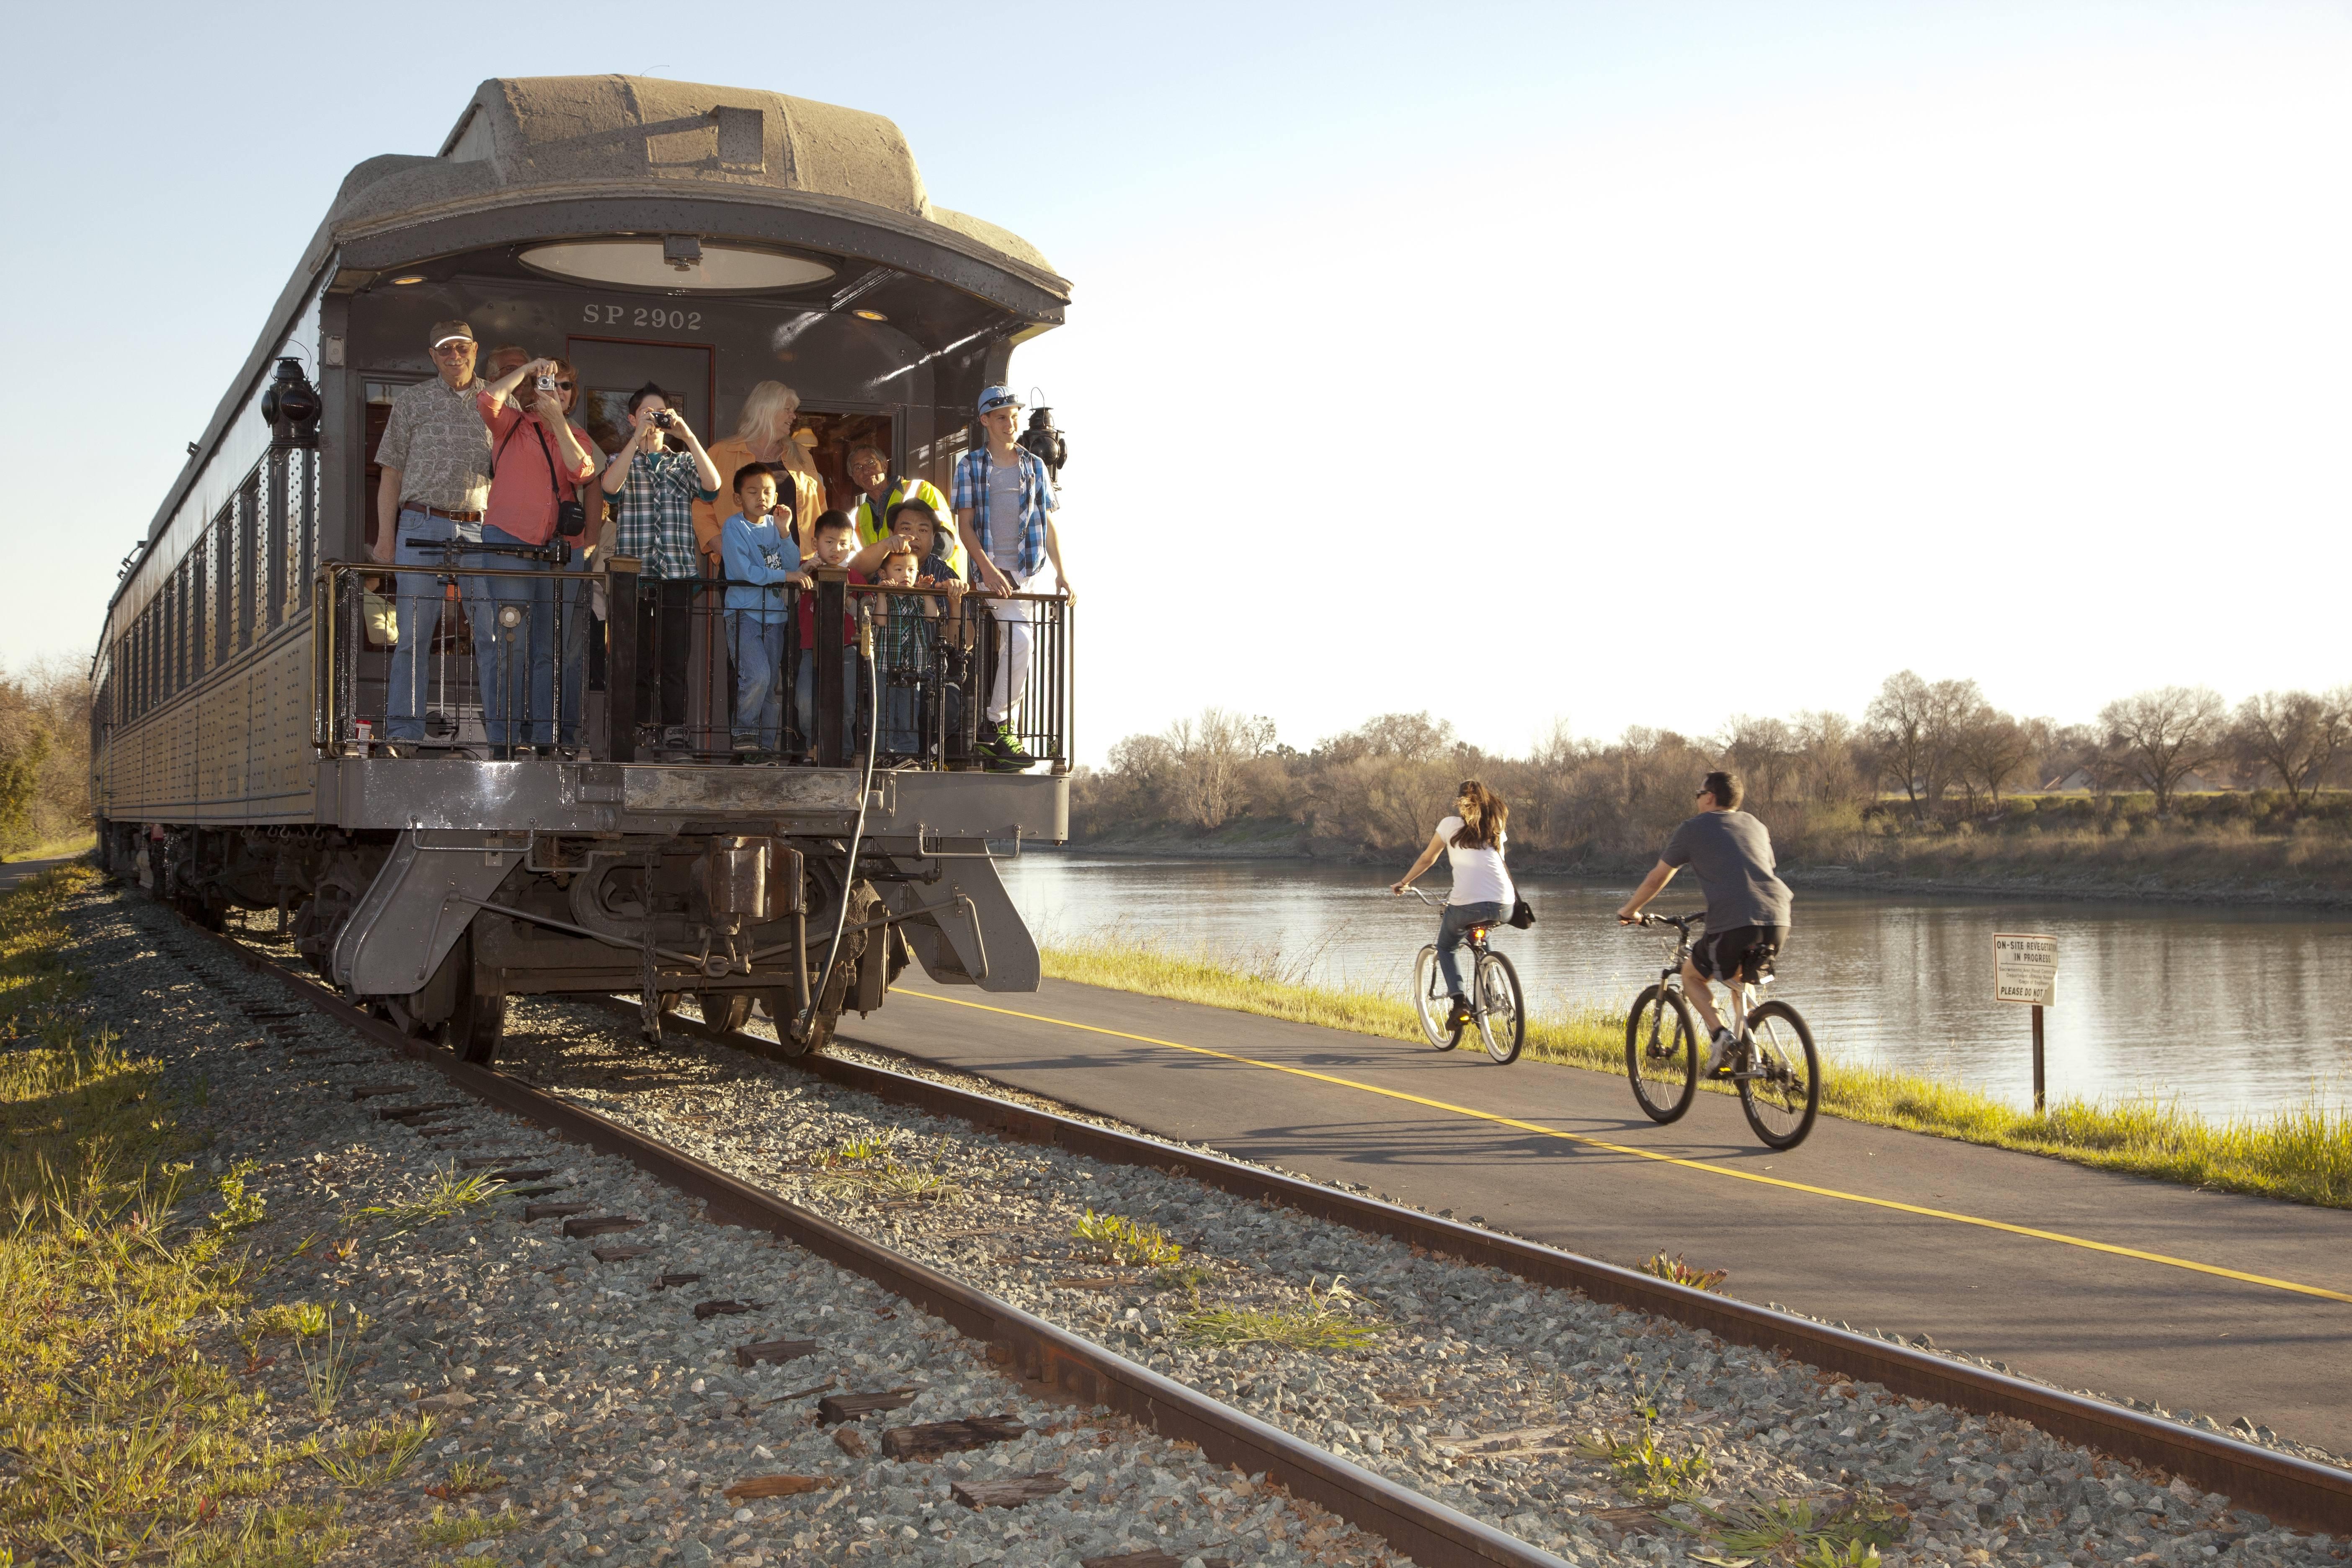 Tuesdays are for Train Rides in Sacramento via @sacramentopress